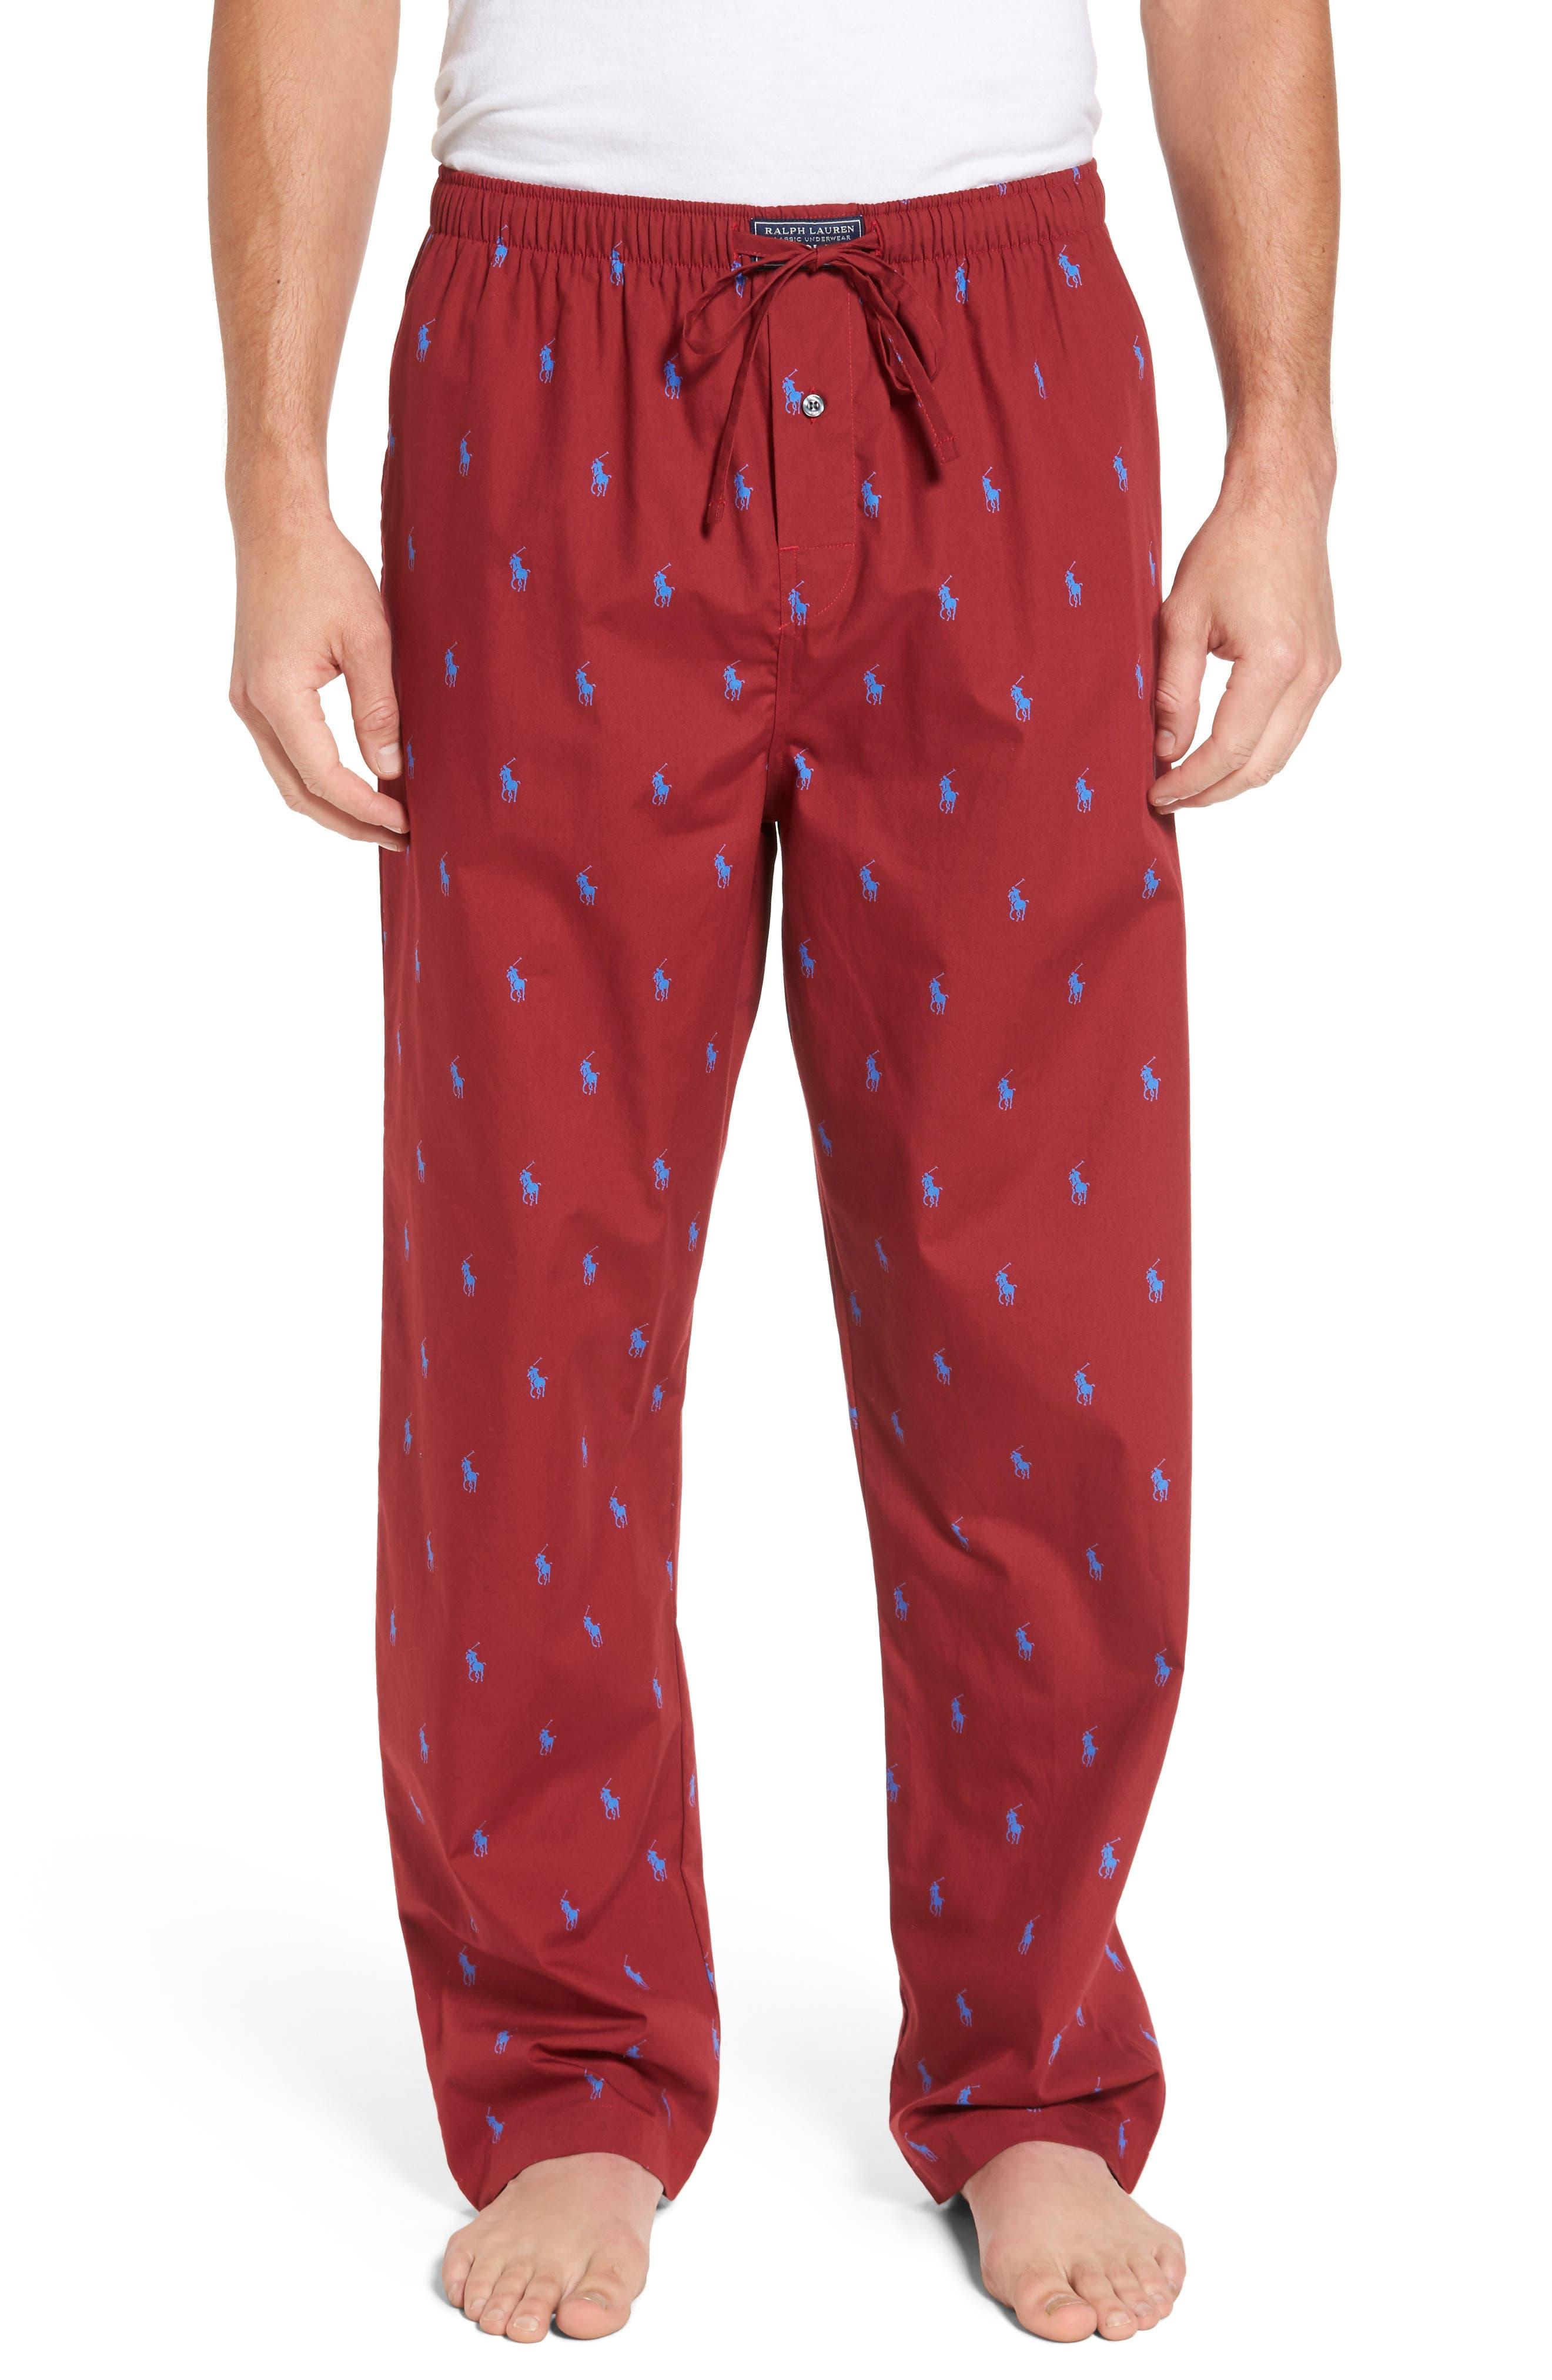 Alternate Image 1 Selected - Polo Ralph Lauren Classic Lounge Pants